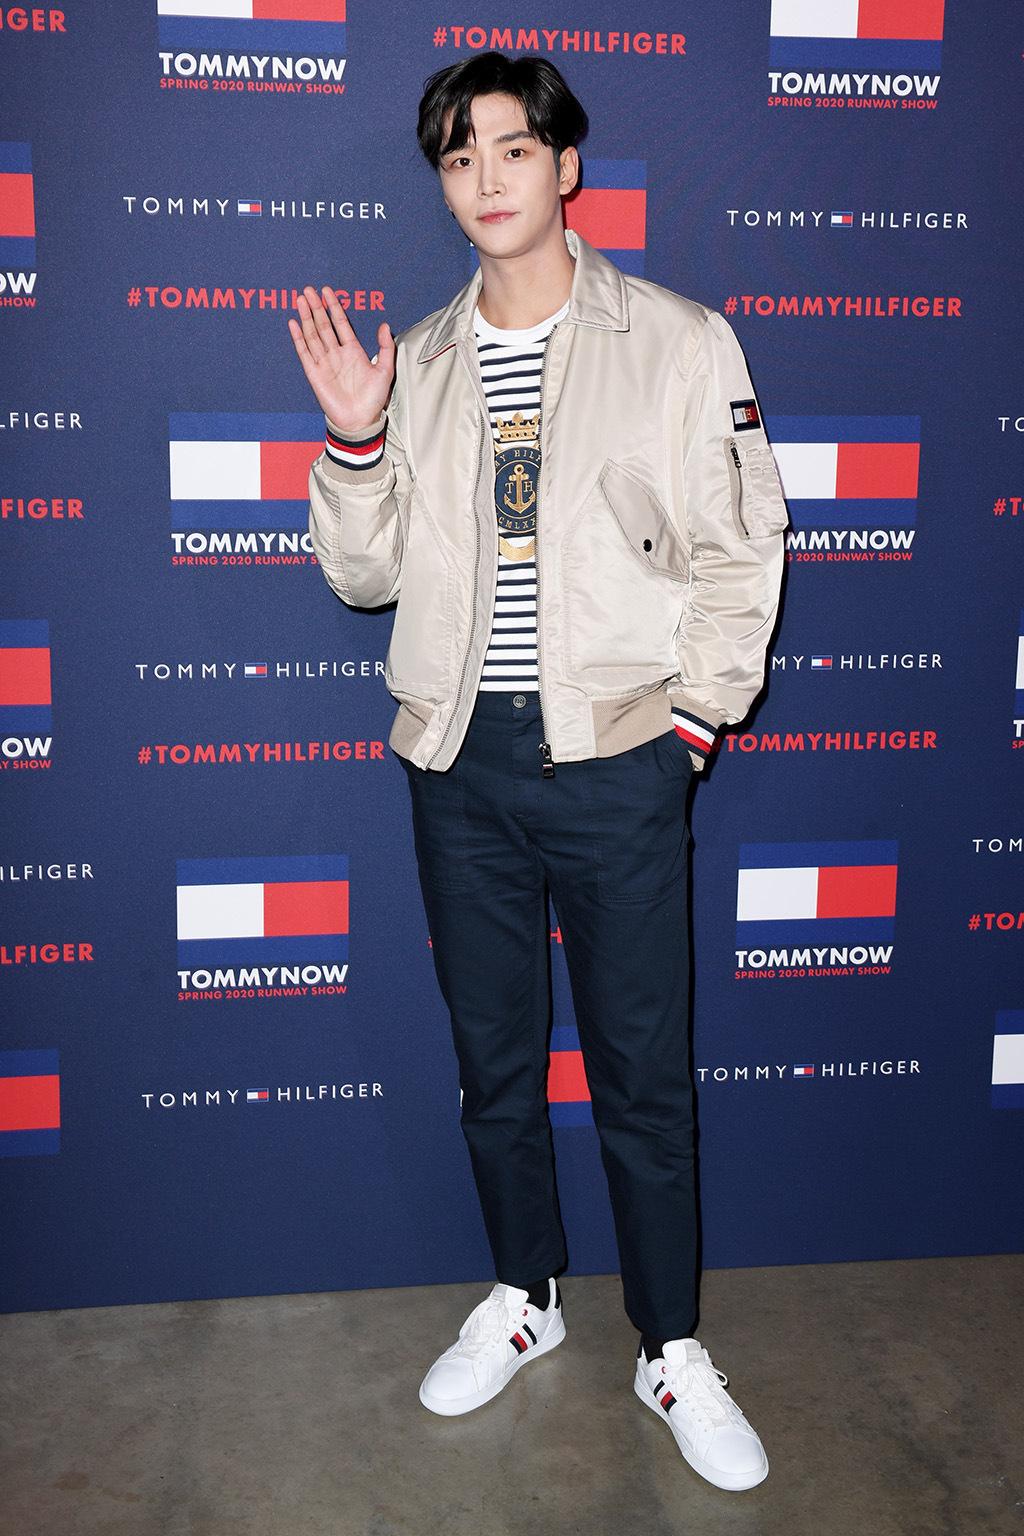 Tommy Hilfiger show, Arrivals, Fall Winter 2020, London Fashion Week, UK - 16 Feb 2020